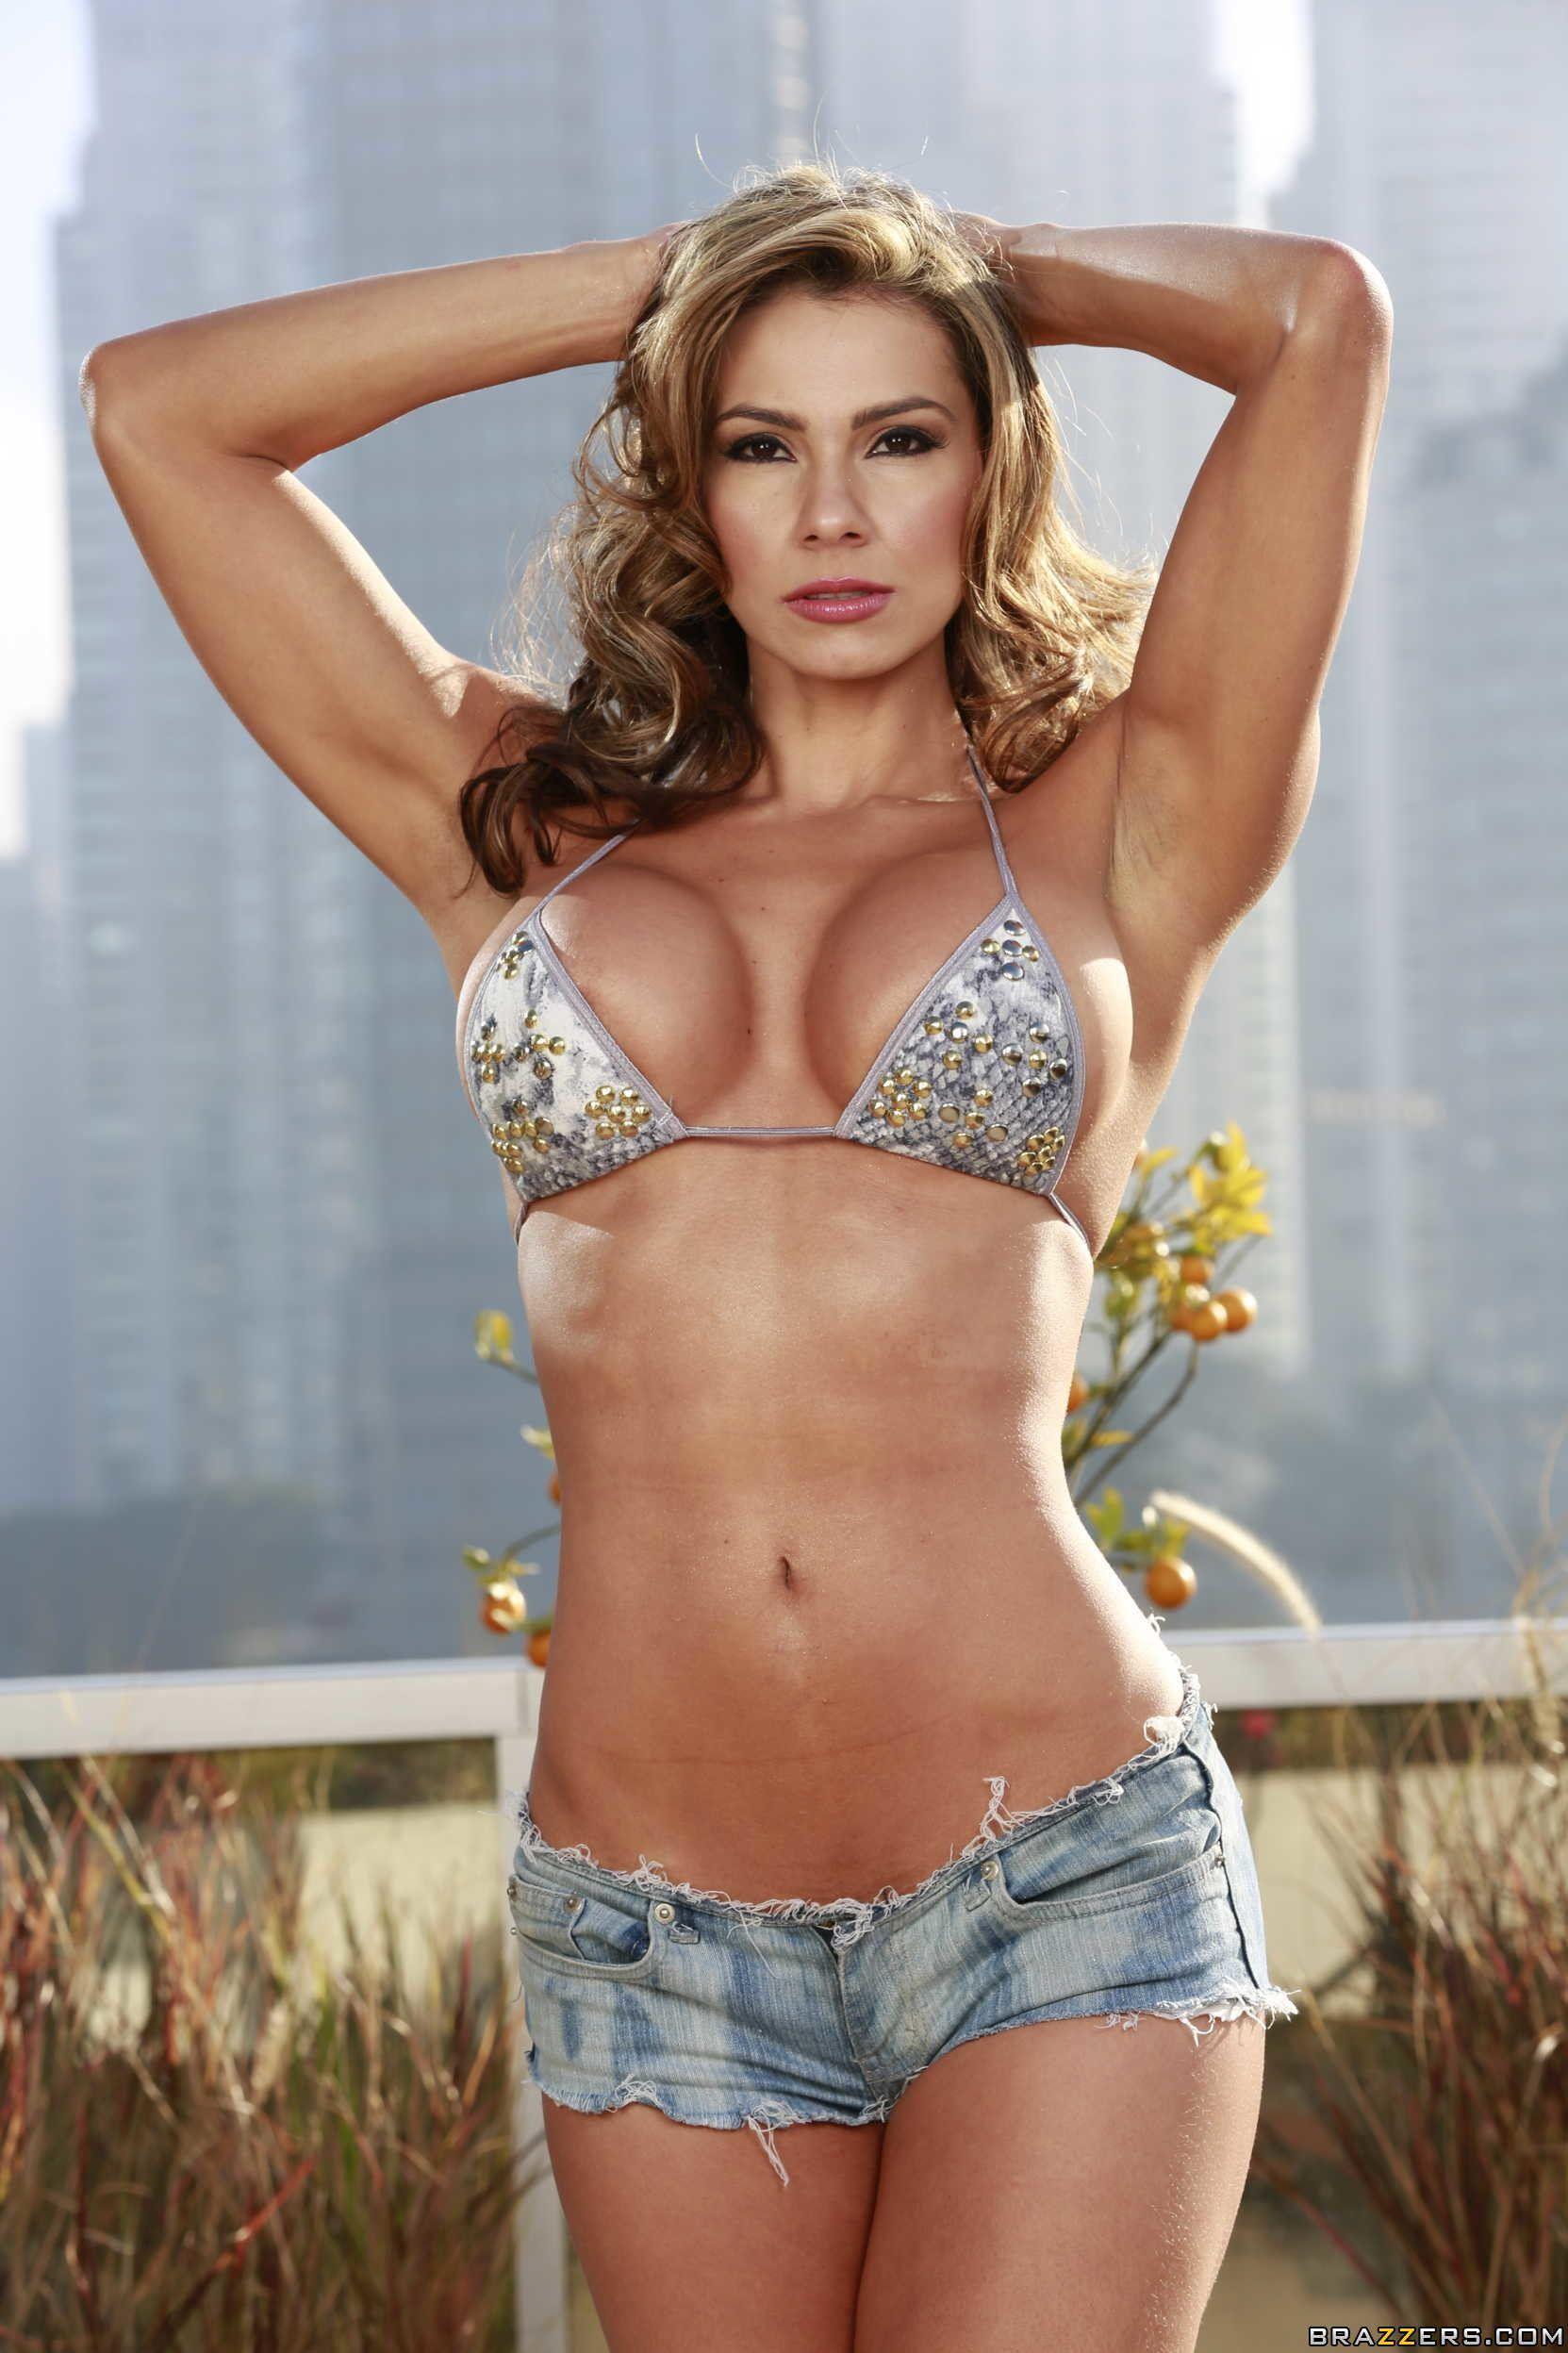 Esperanza Gomes Nude with regard to 205 best esperanza gomez images on pinterest | beautiful women